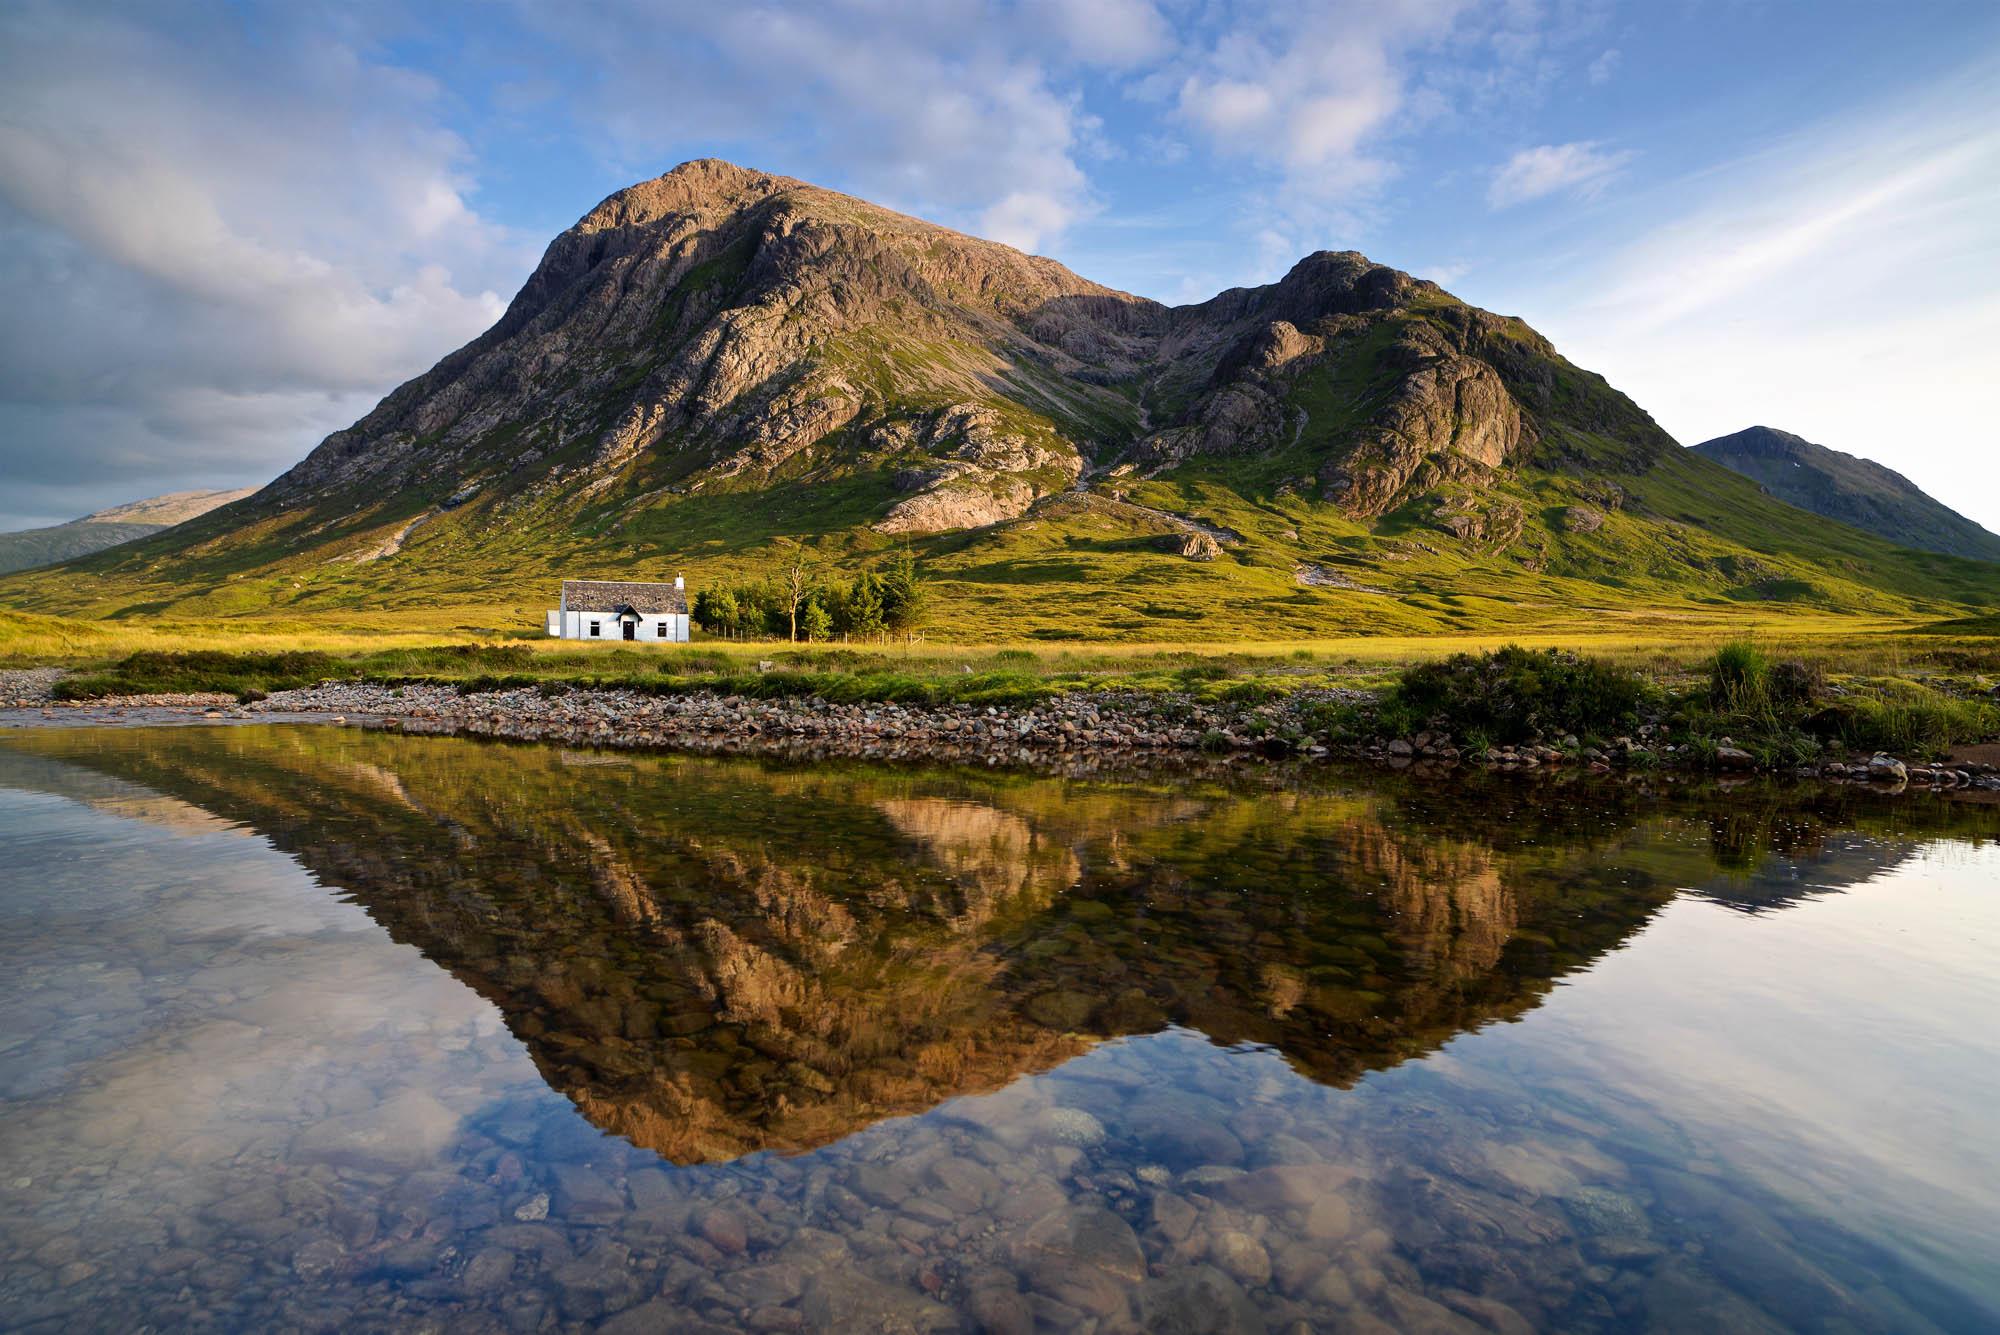 Summer reflections at Glencoe, Scotland